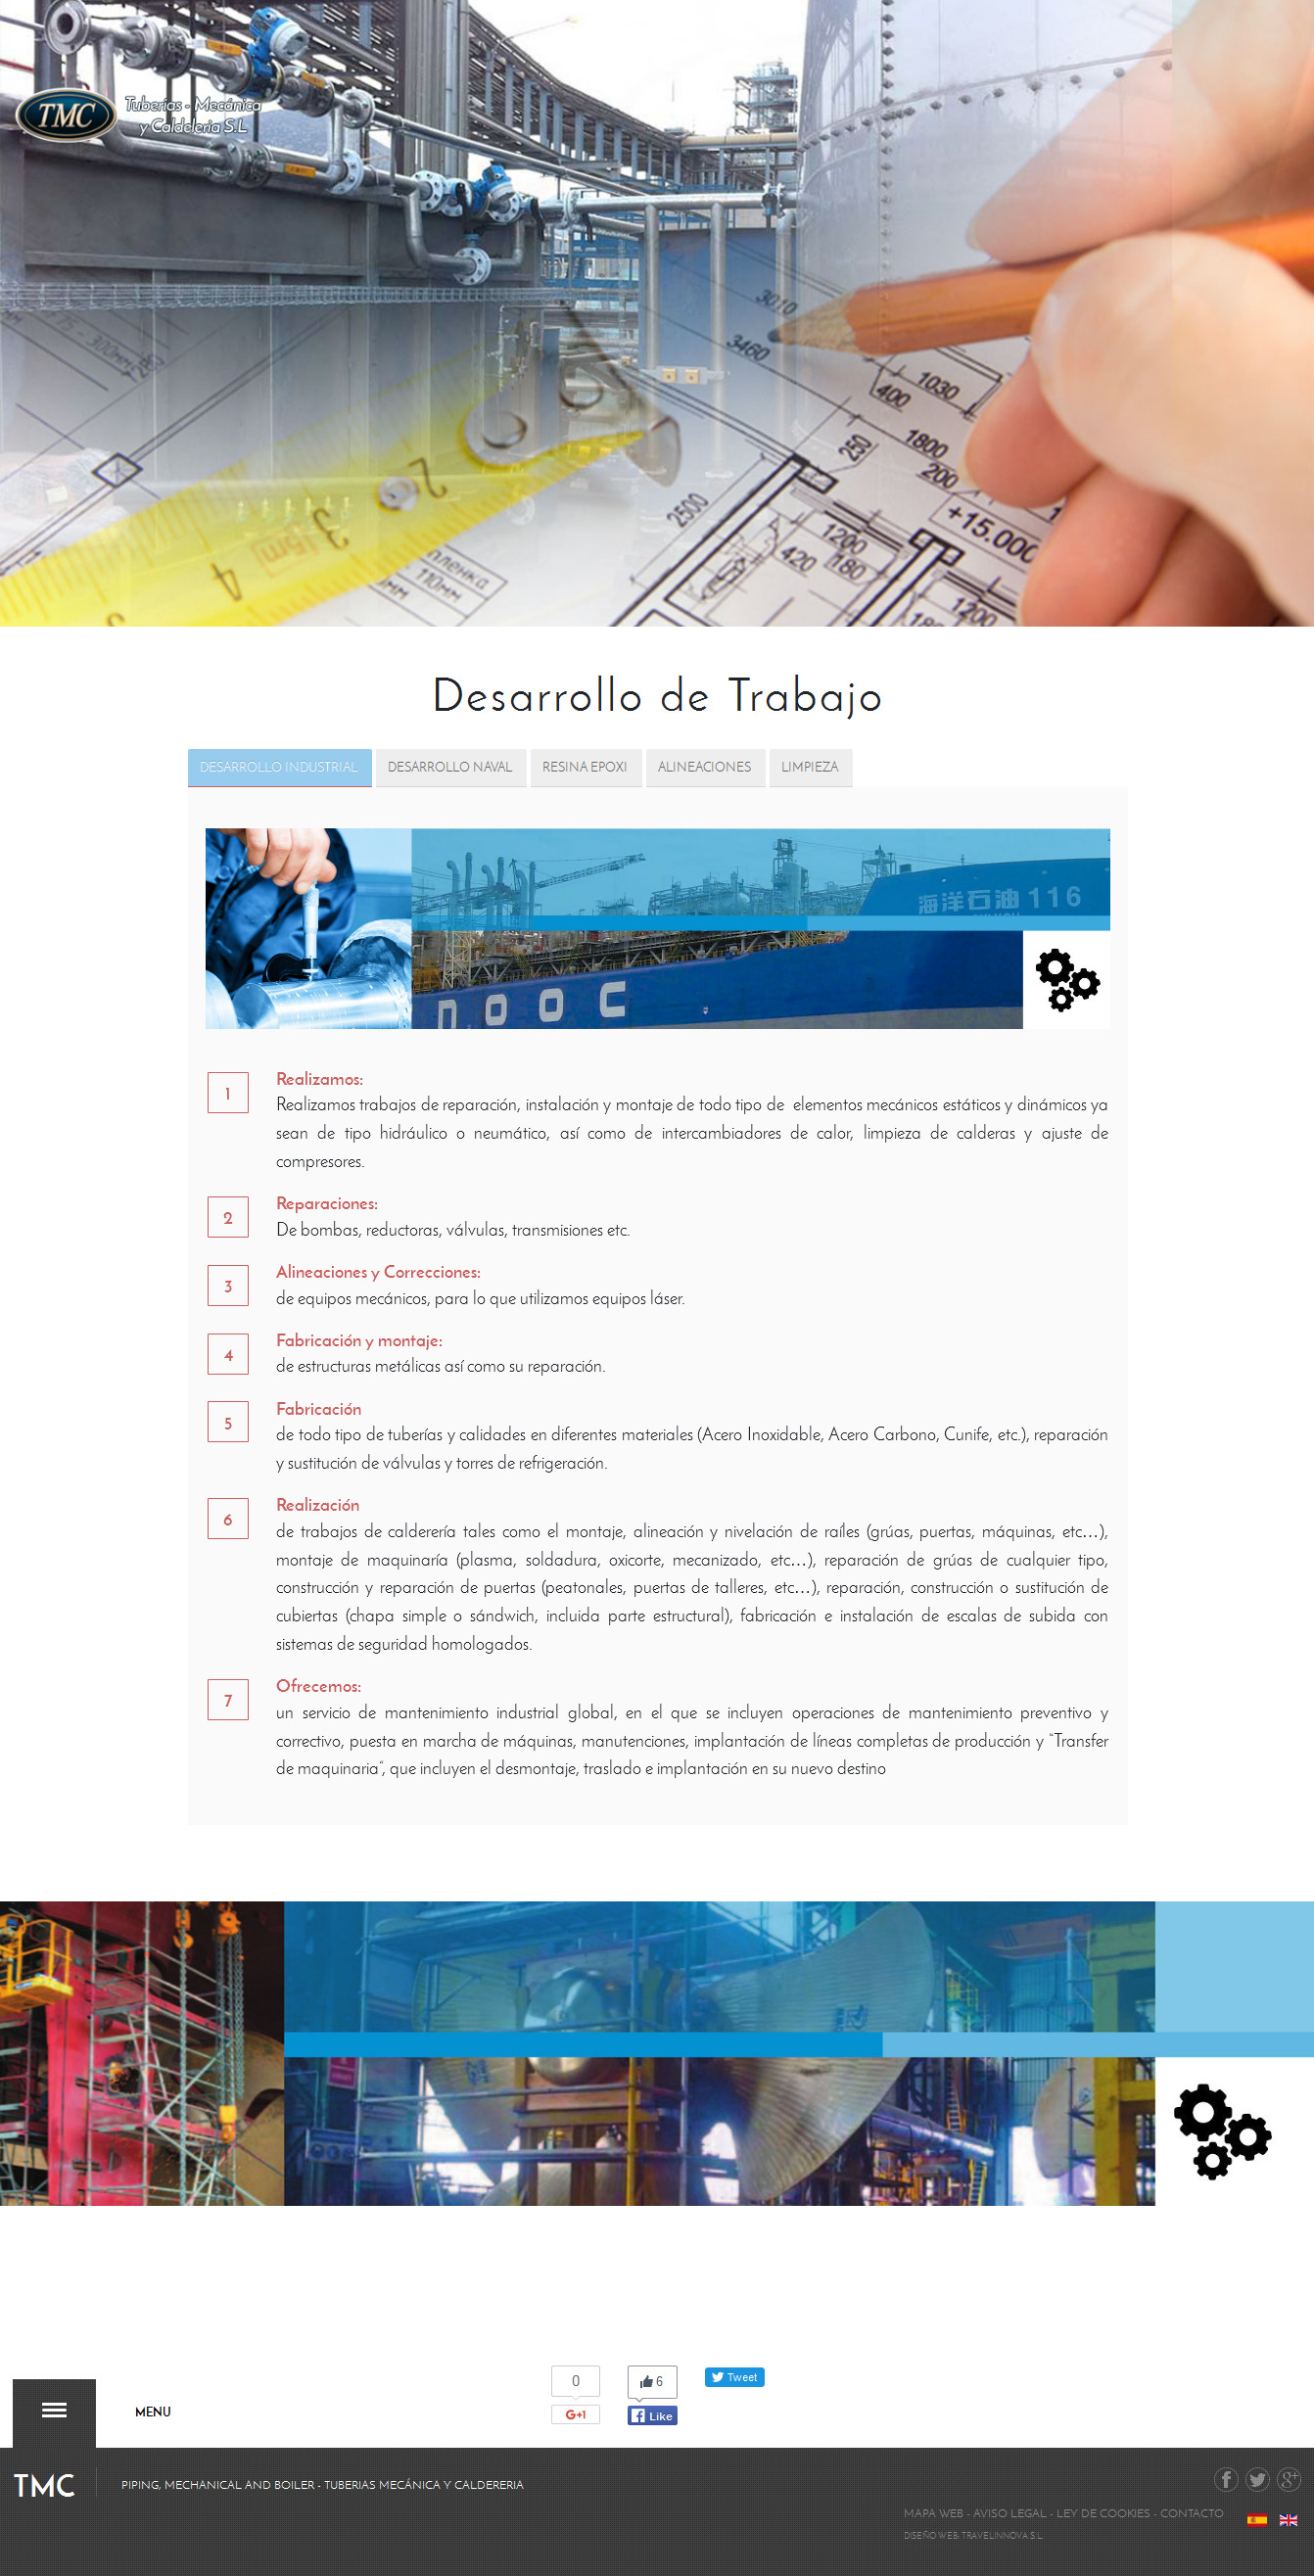 004-tmc-web-desarrollo